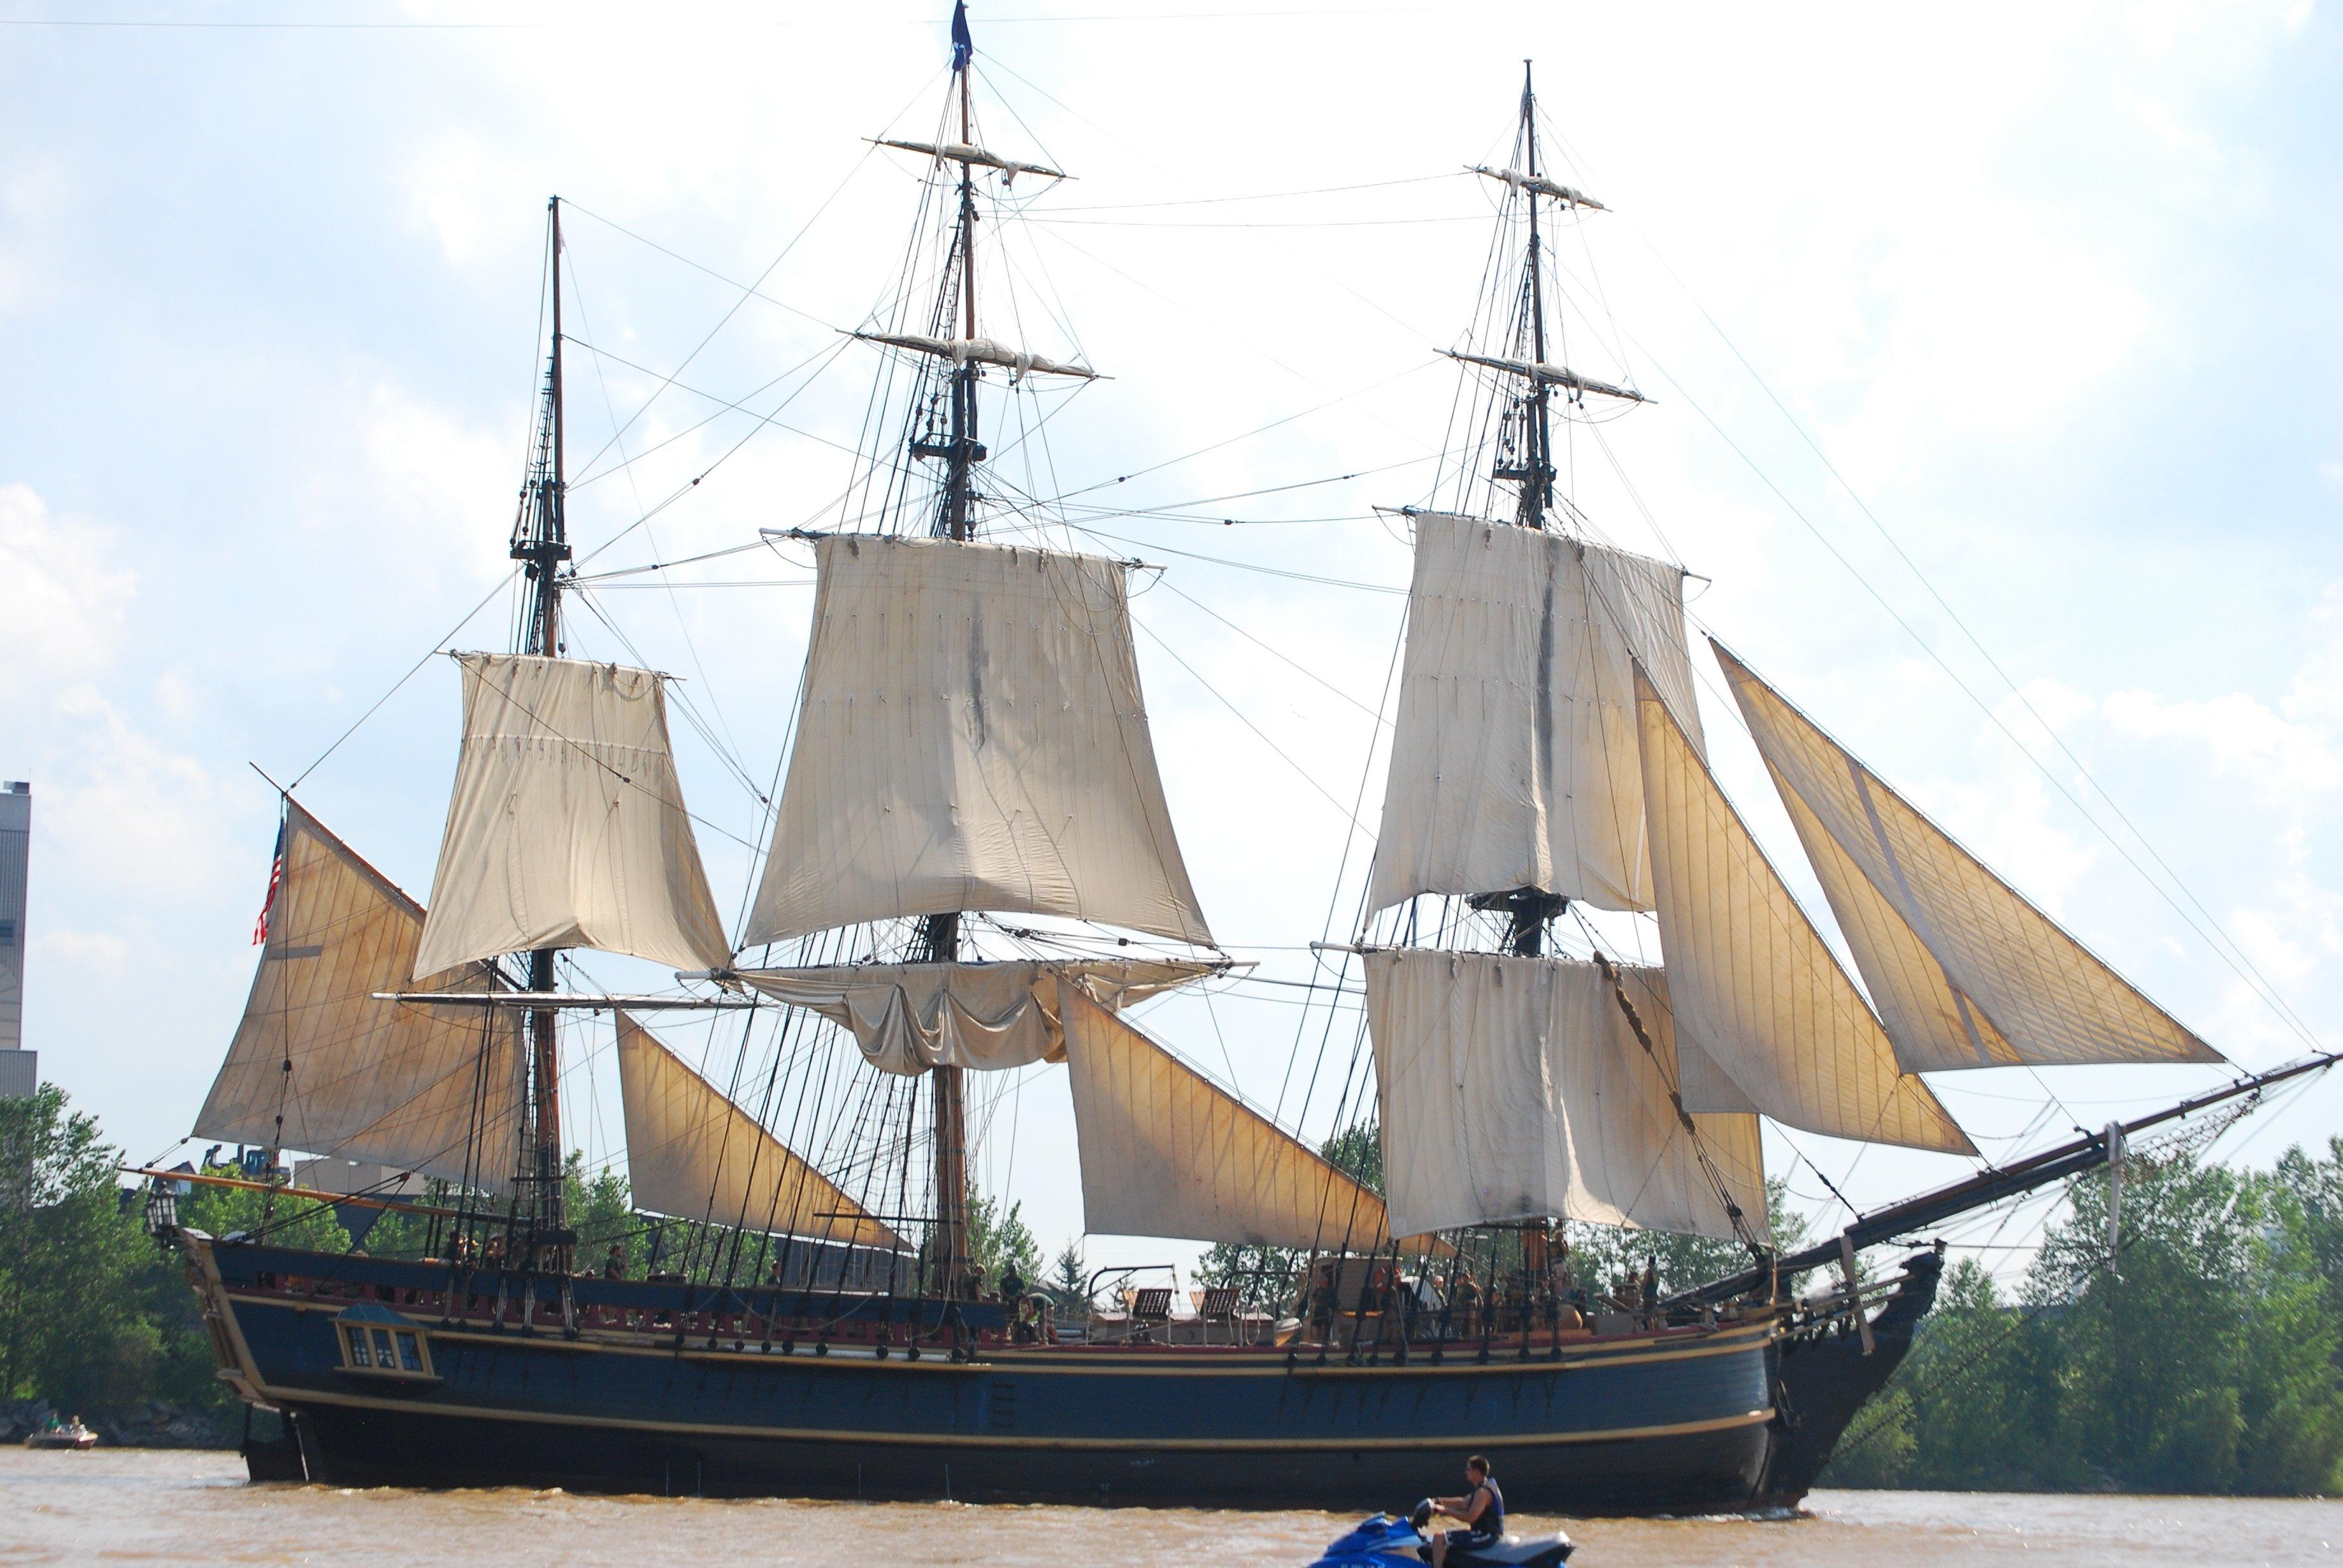 Image libre motomarine voile bateau pirate marine - Voile bateau pirate ...